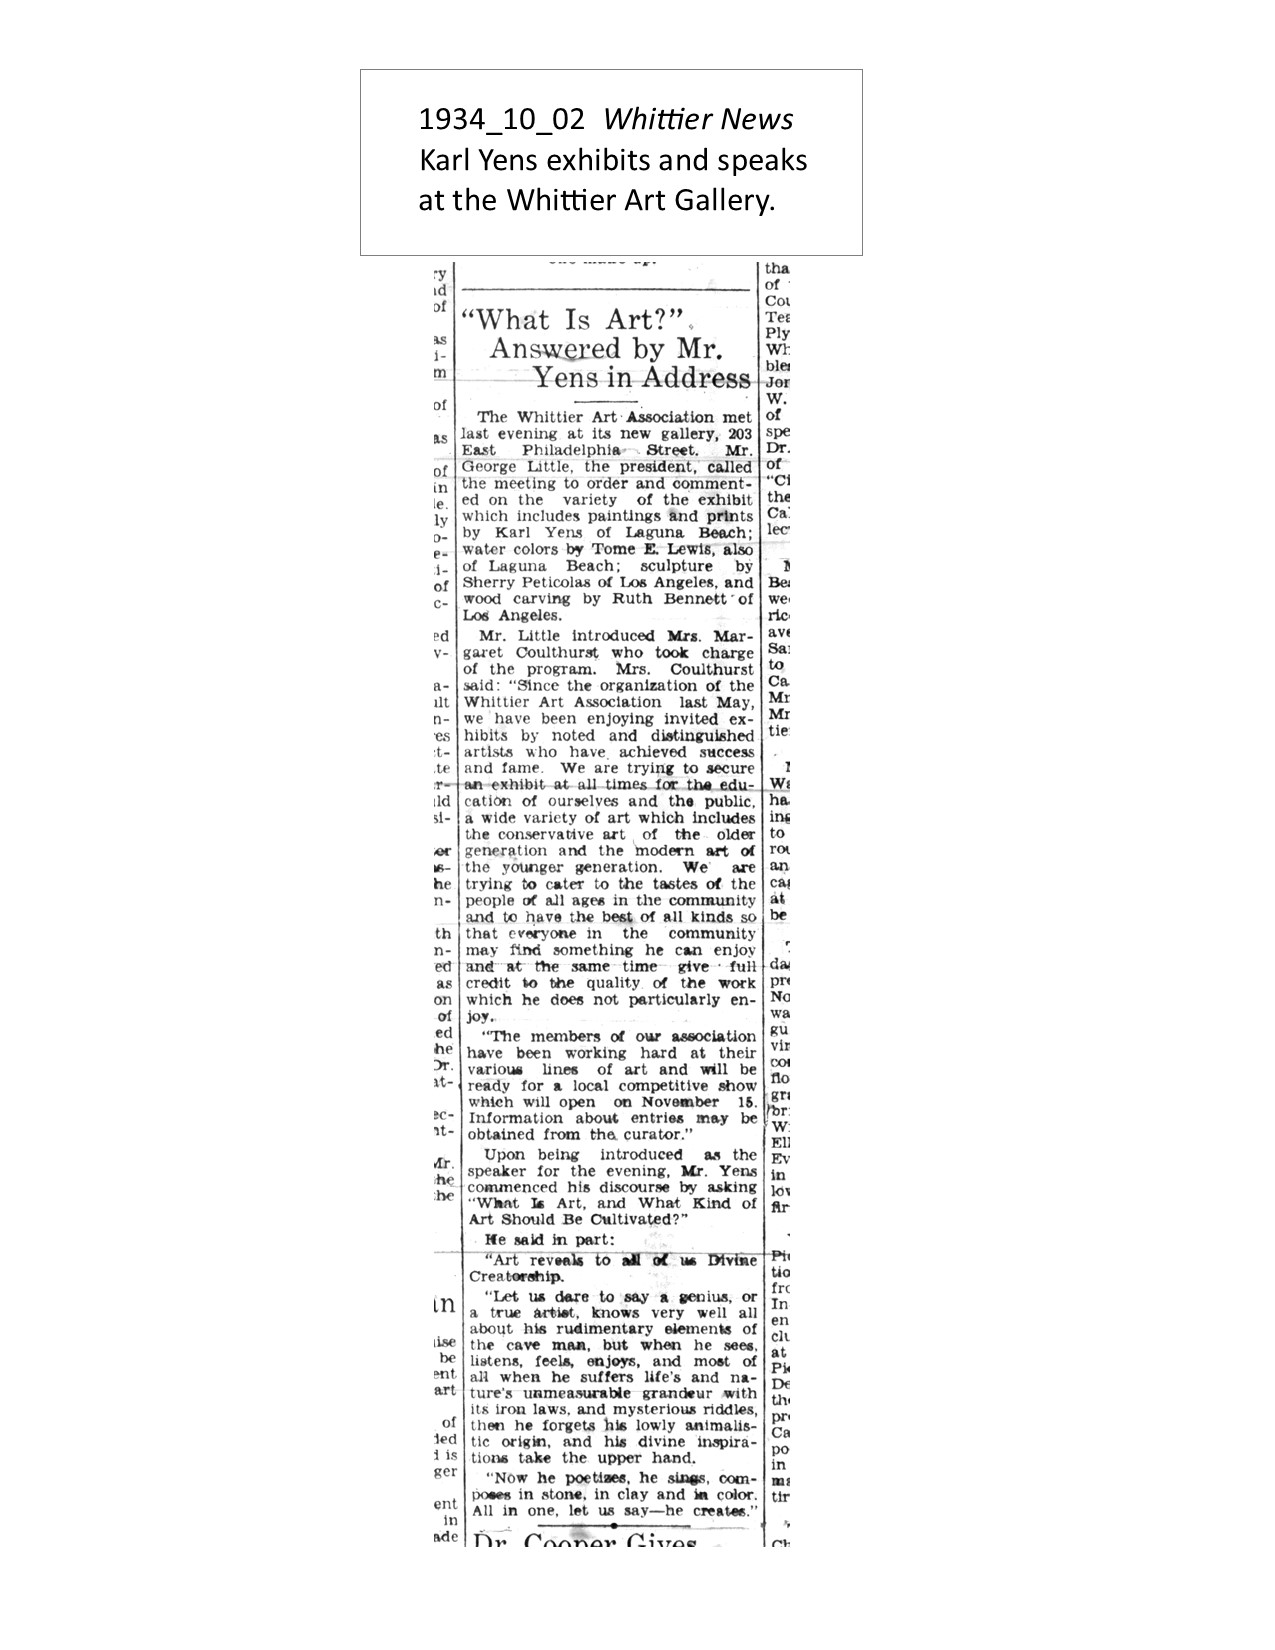 1934_10_02 Whittier News Karl Yens